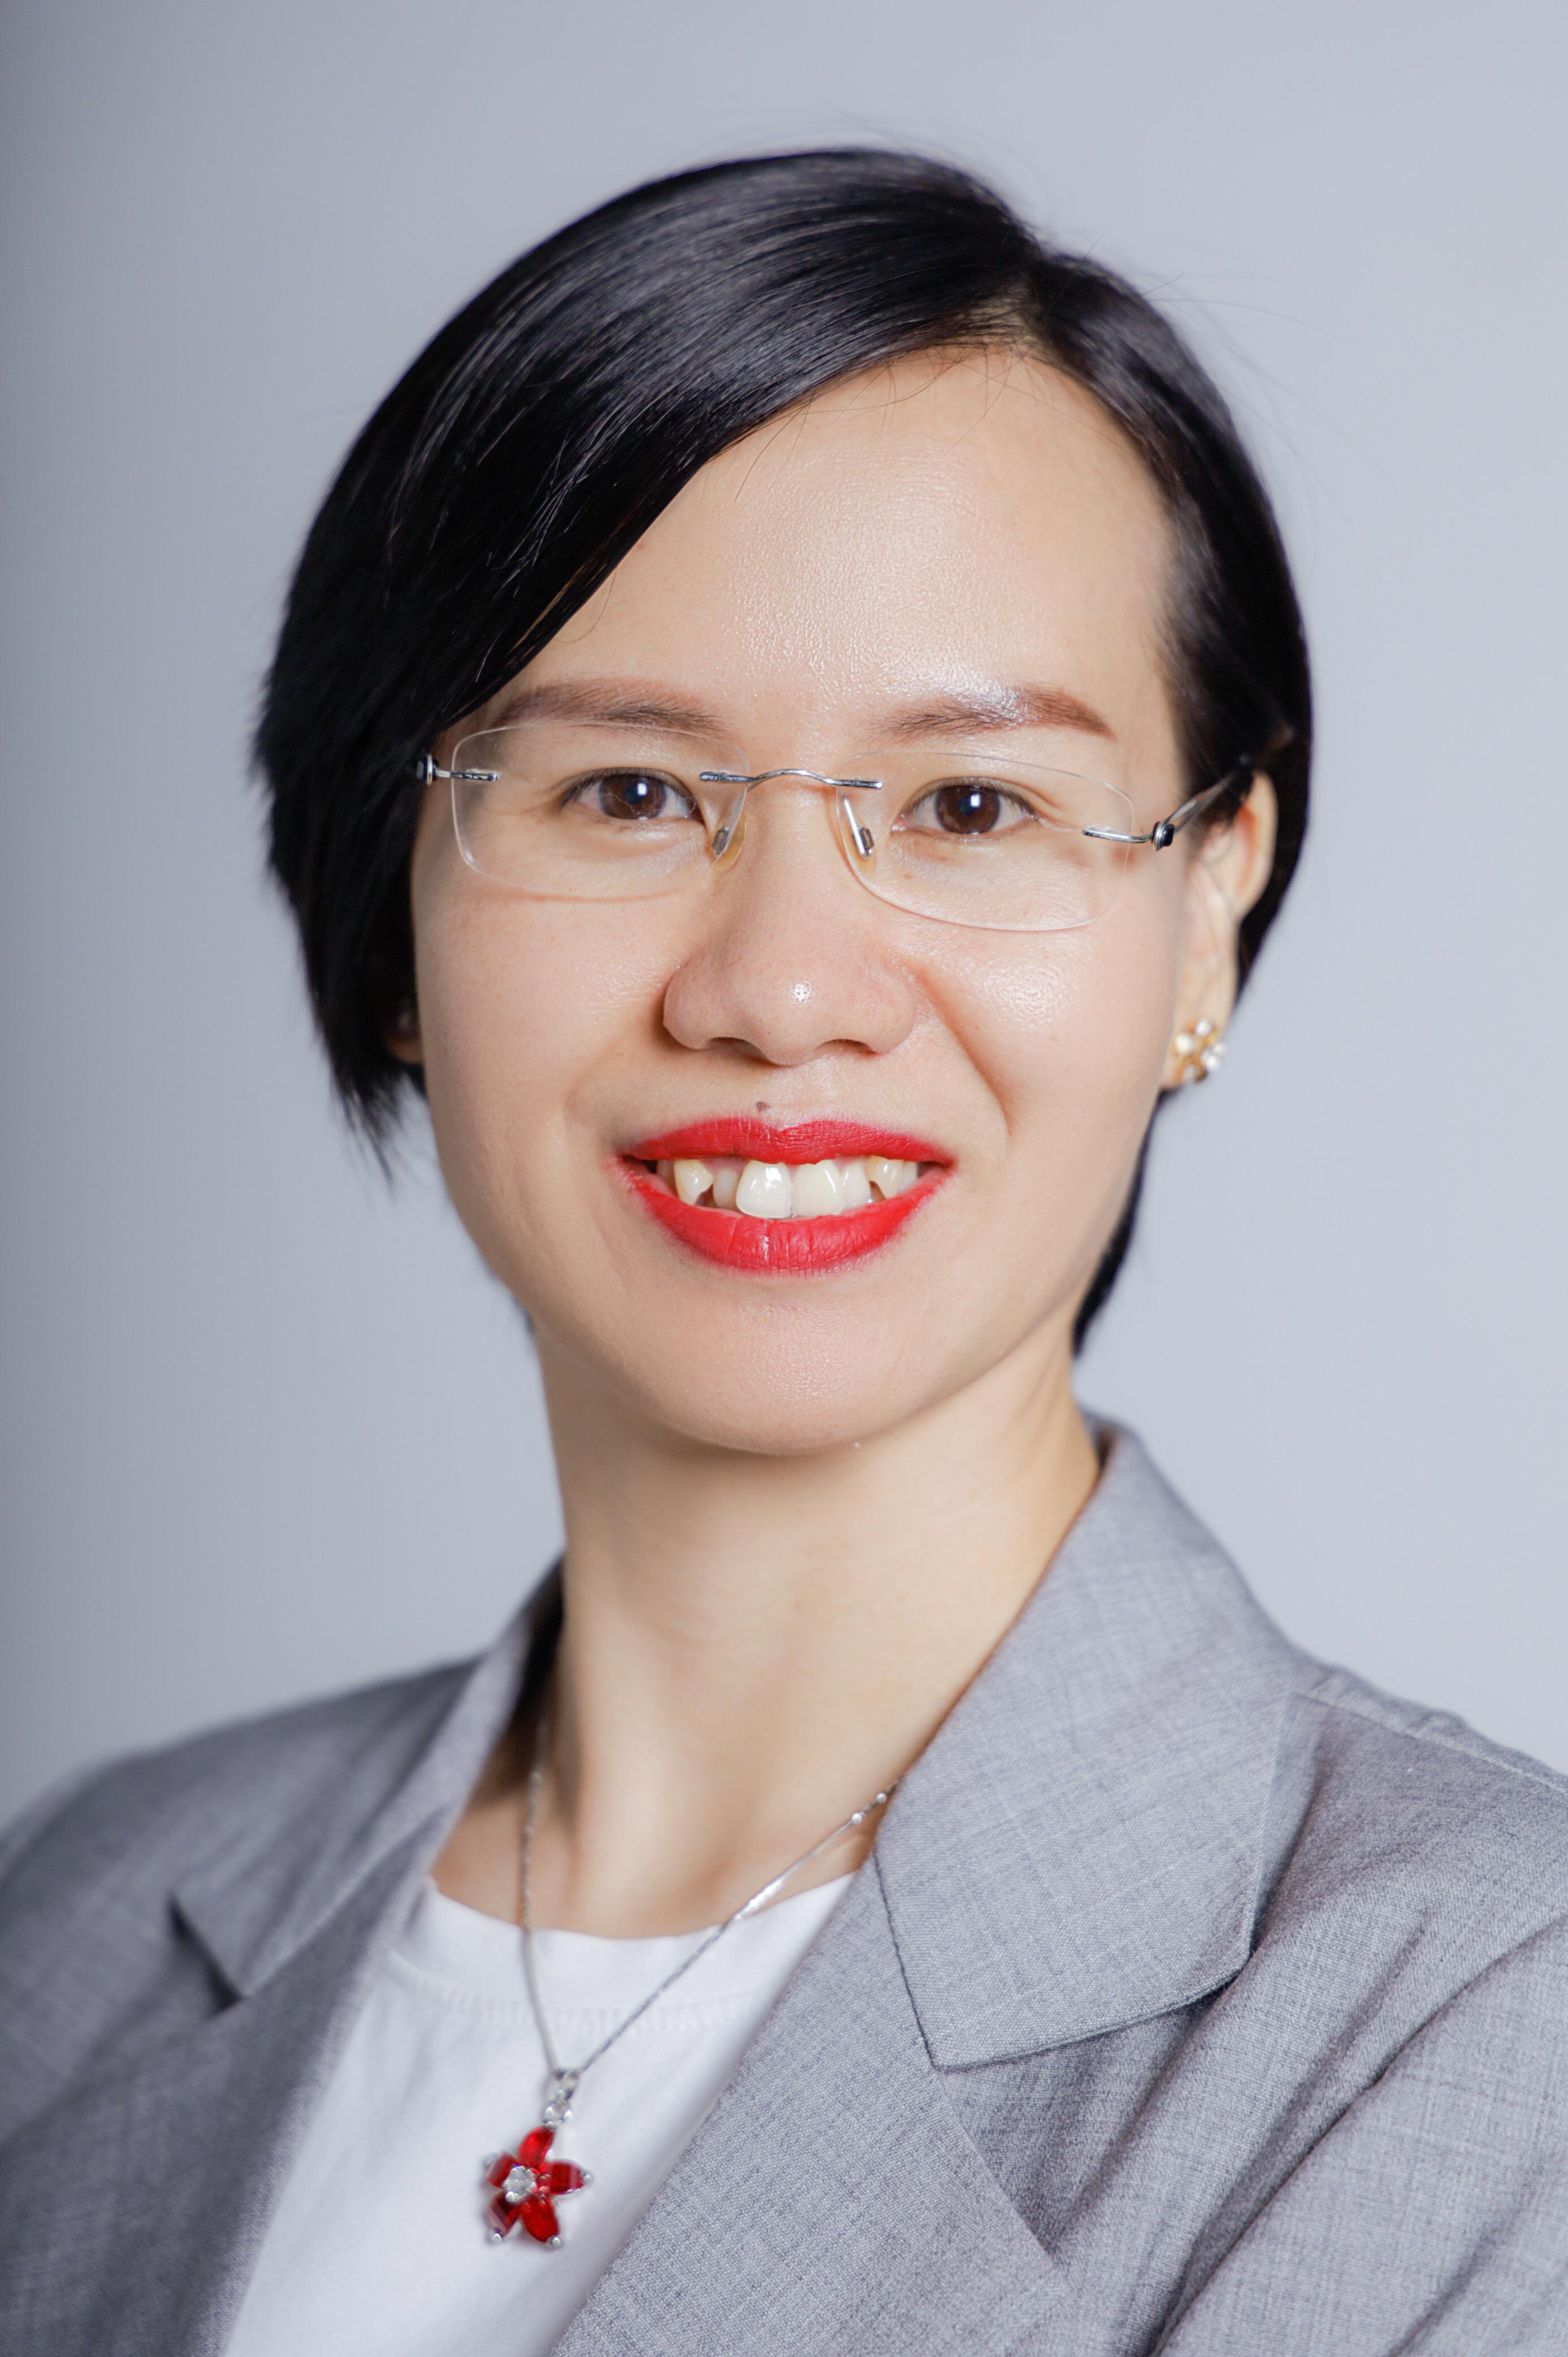 Van Phan of sharesource.com.au